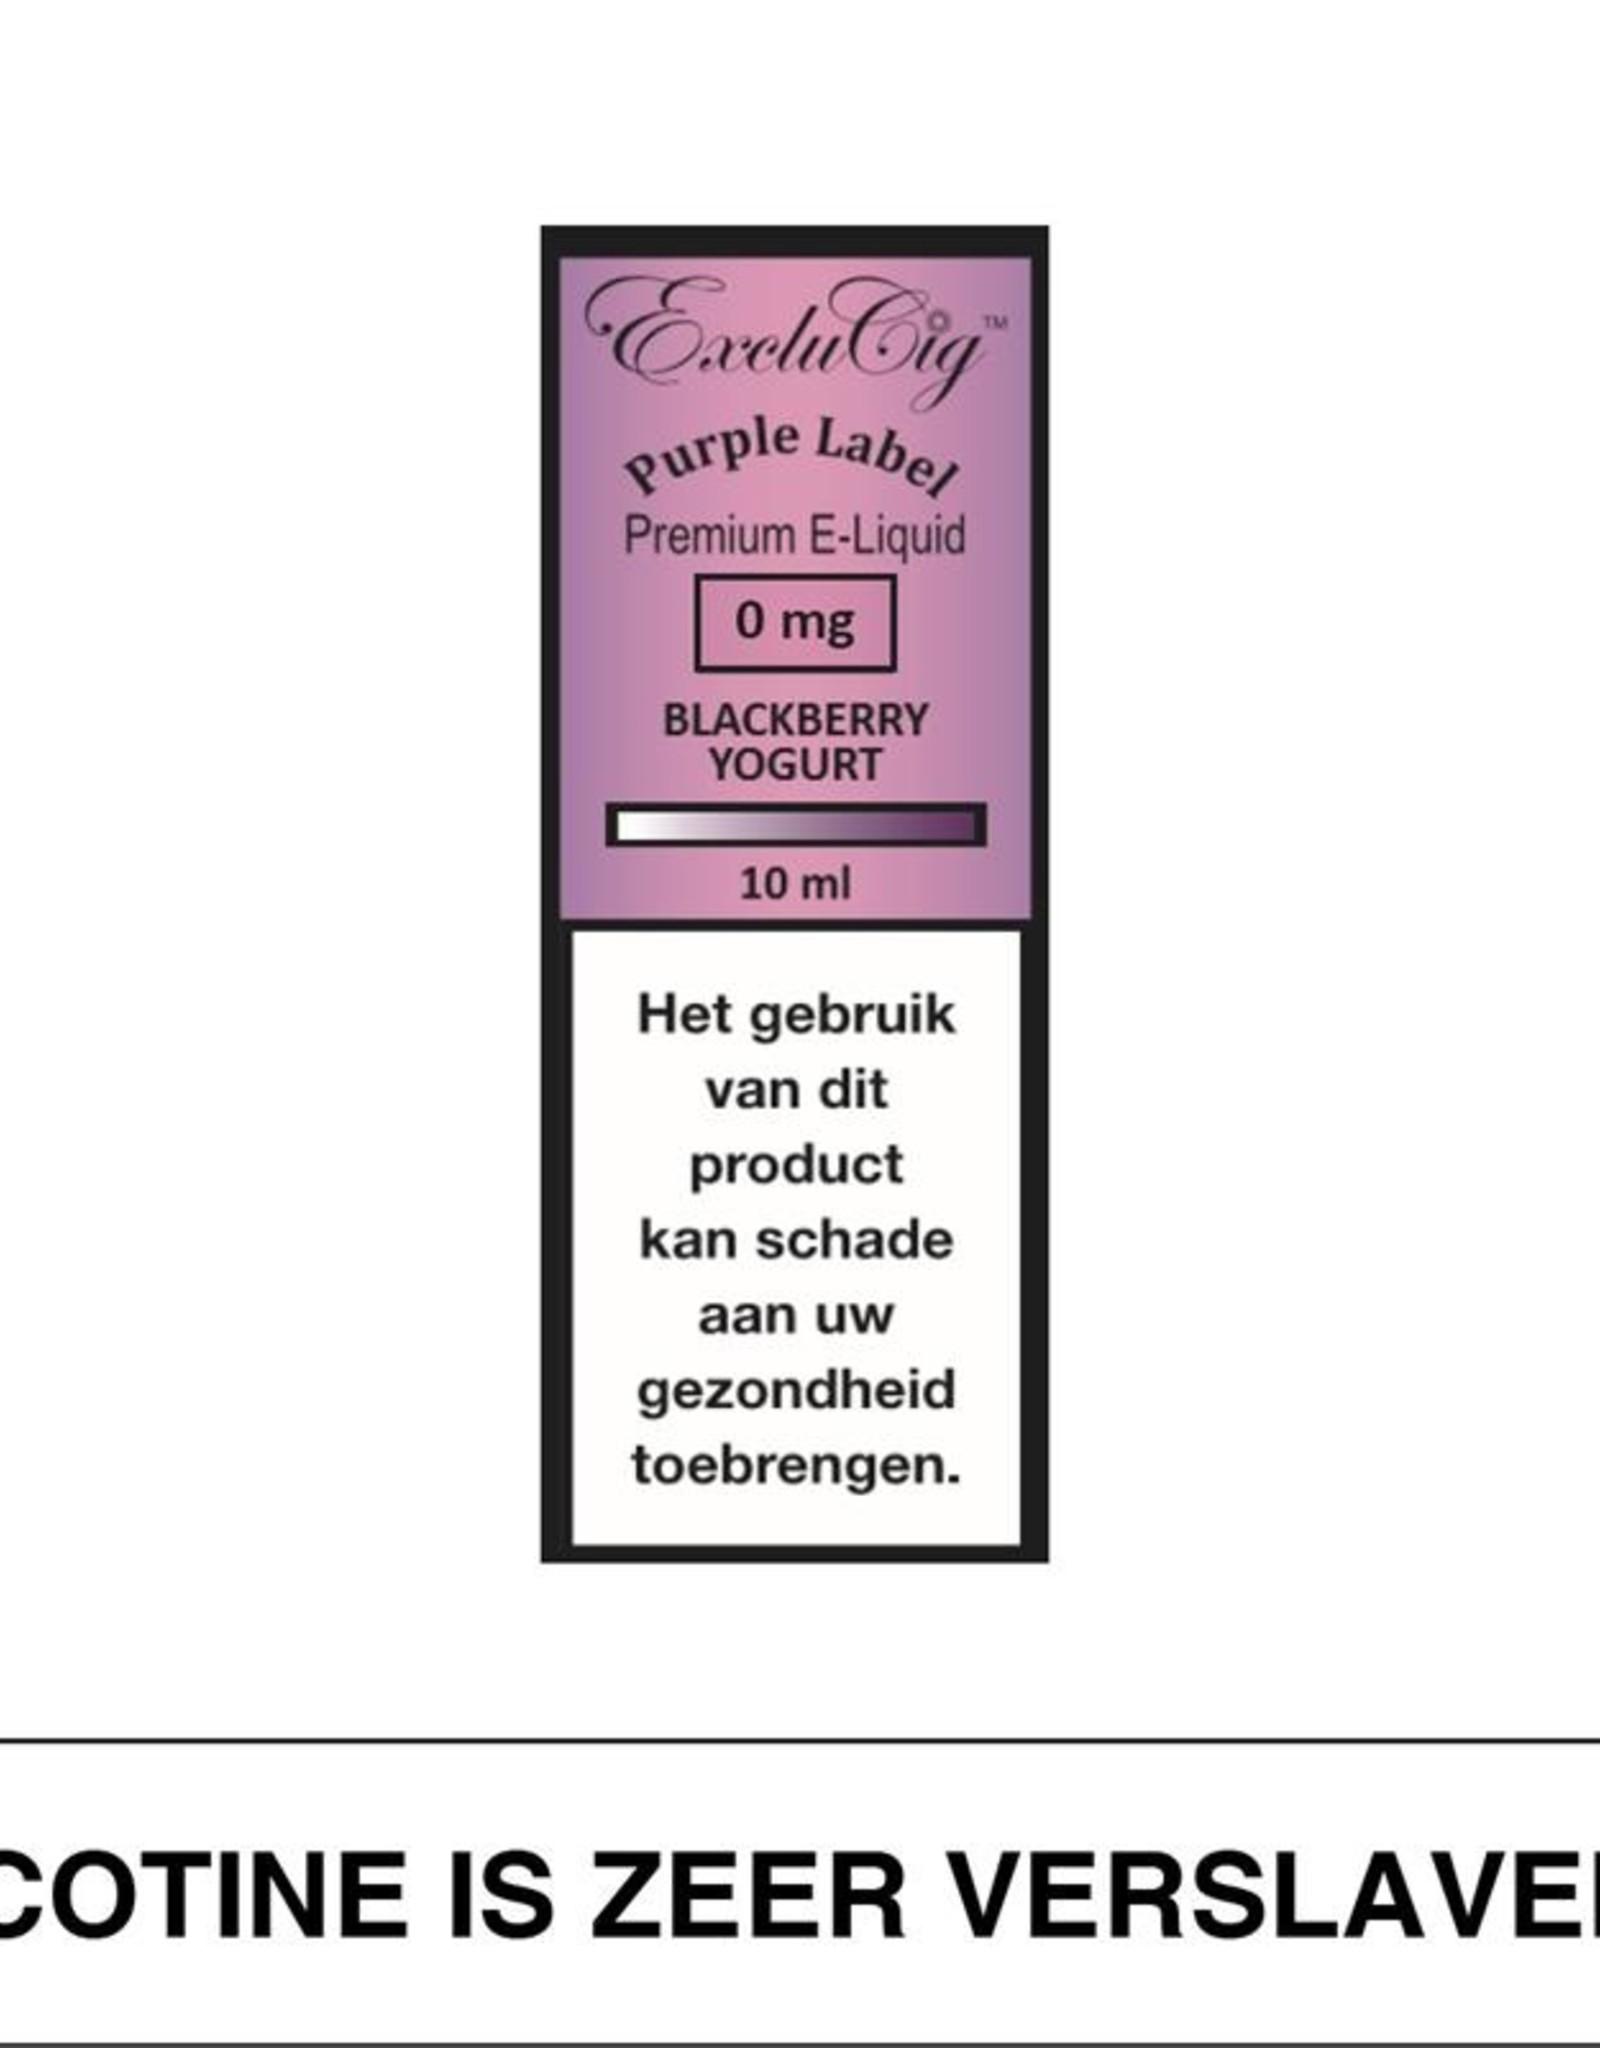 Exclucig Exclucig Purple Label E-Liquid Blackberry Yoghurt 0 mg Nicotine